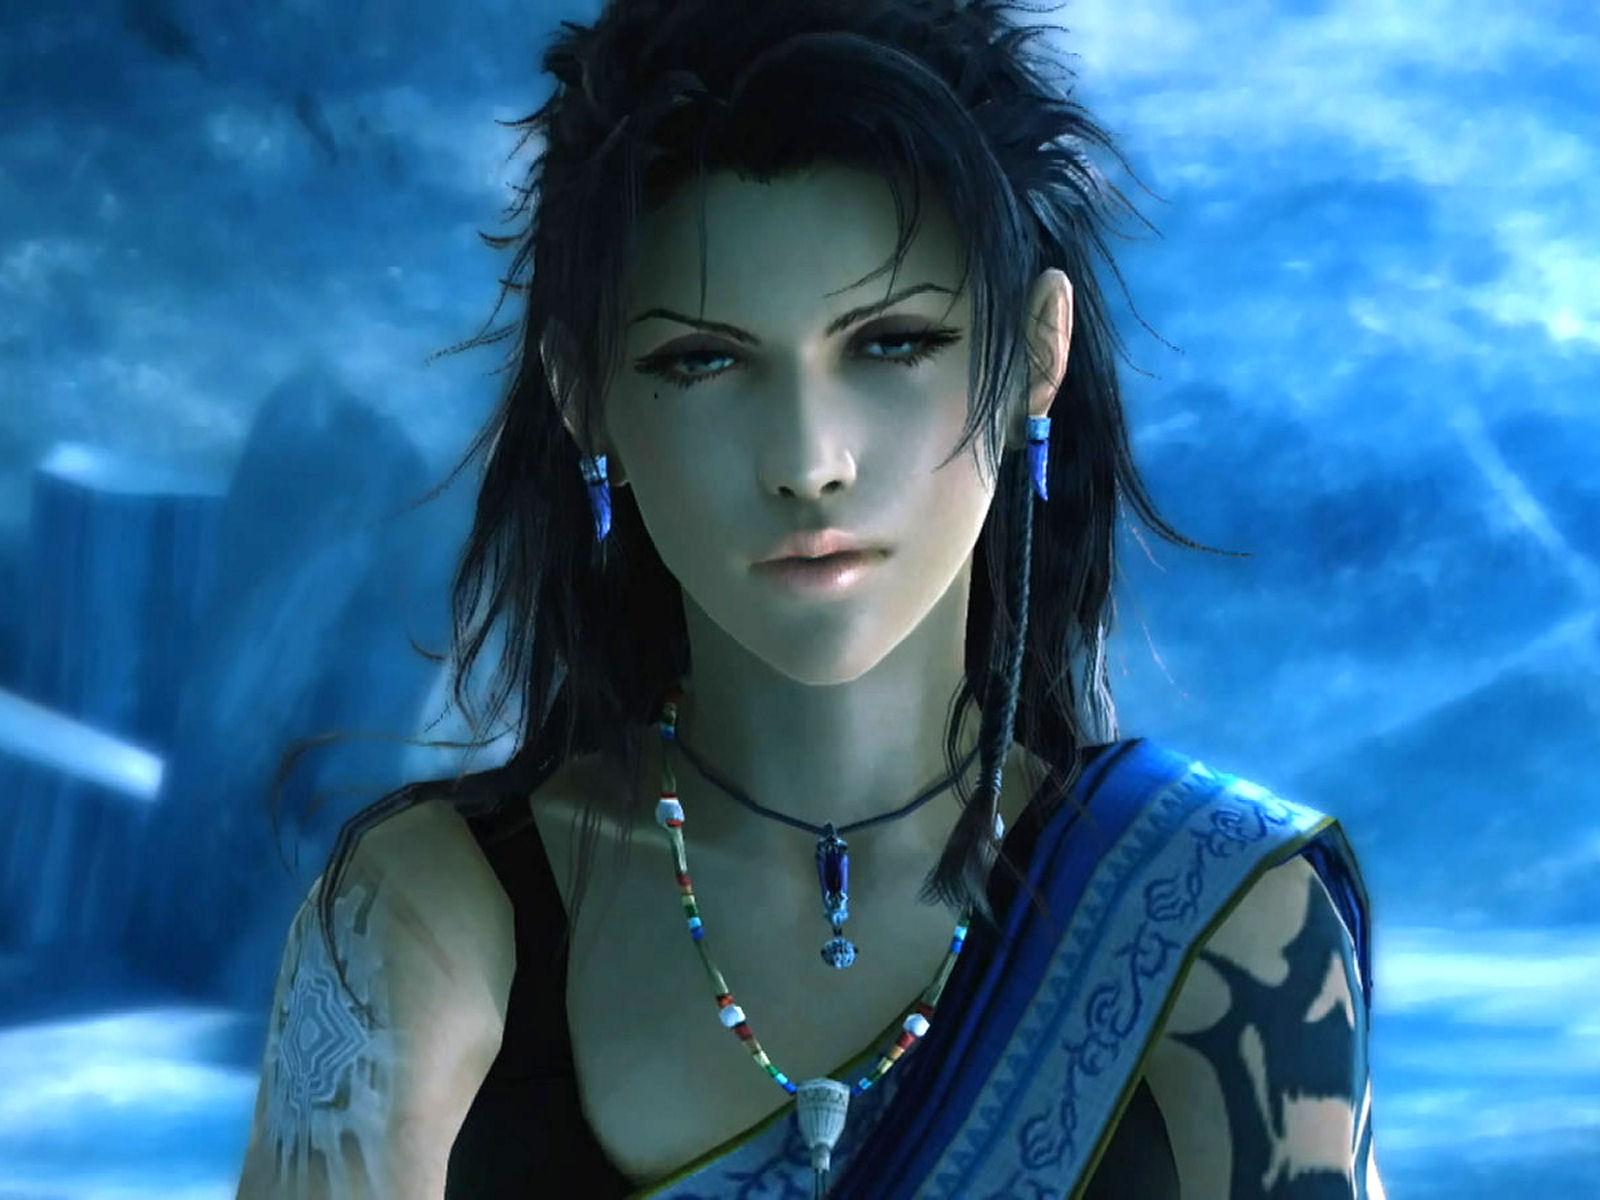 Free PSP Themes Wallpaper: Final Fantasy PSP Wallpaper